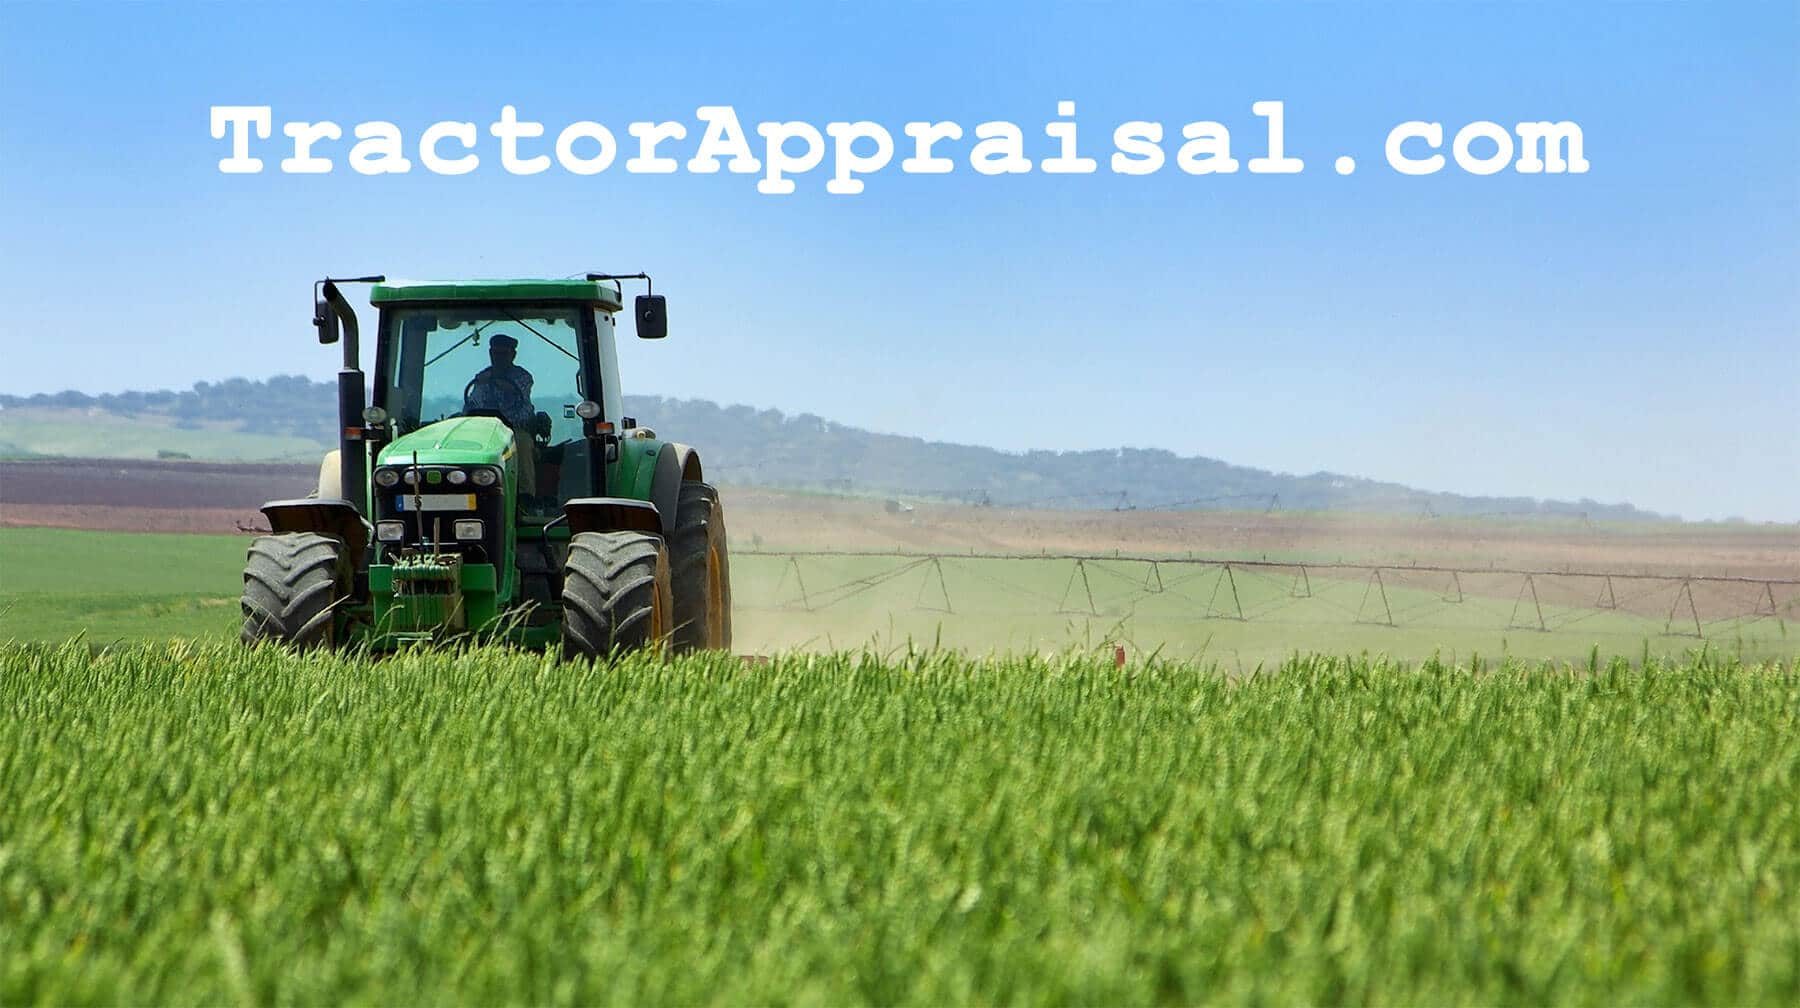 Tractor Appraisal